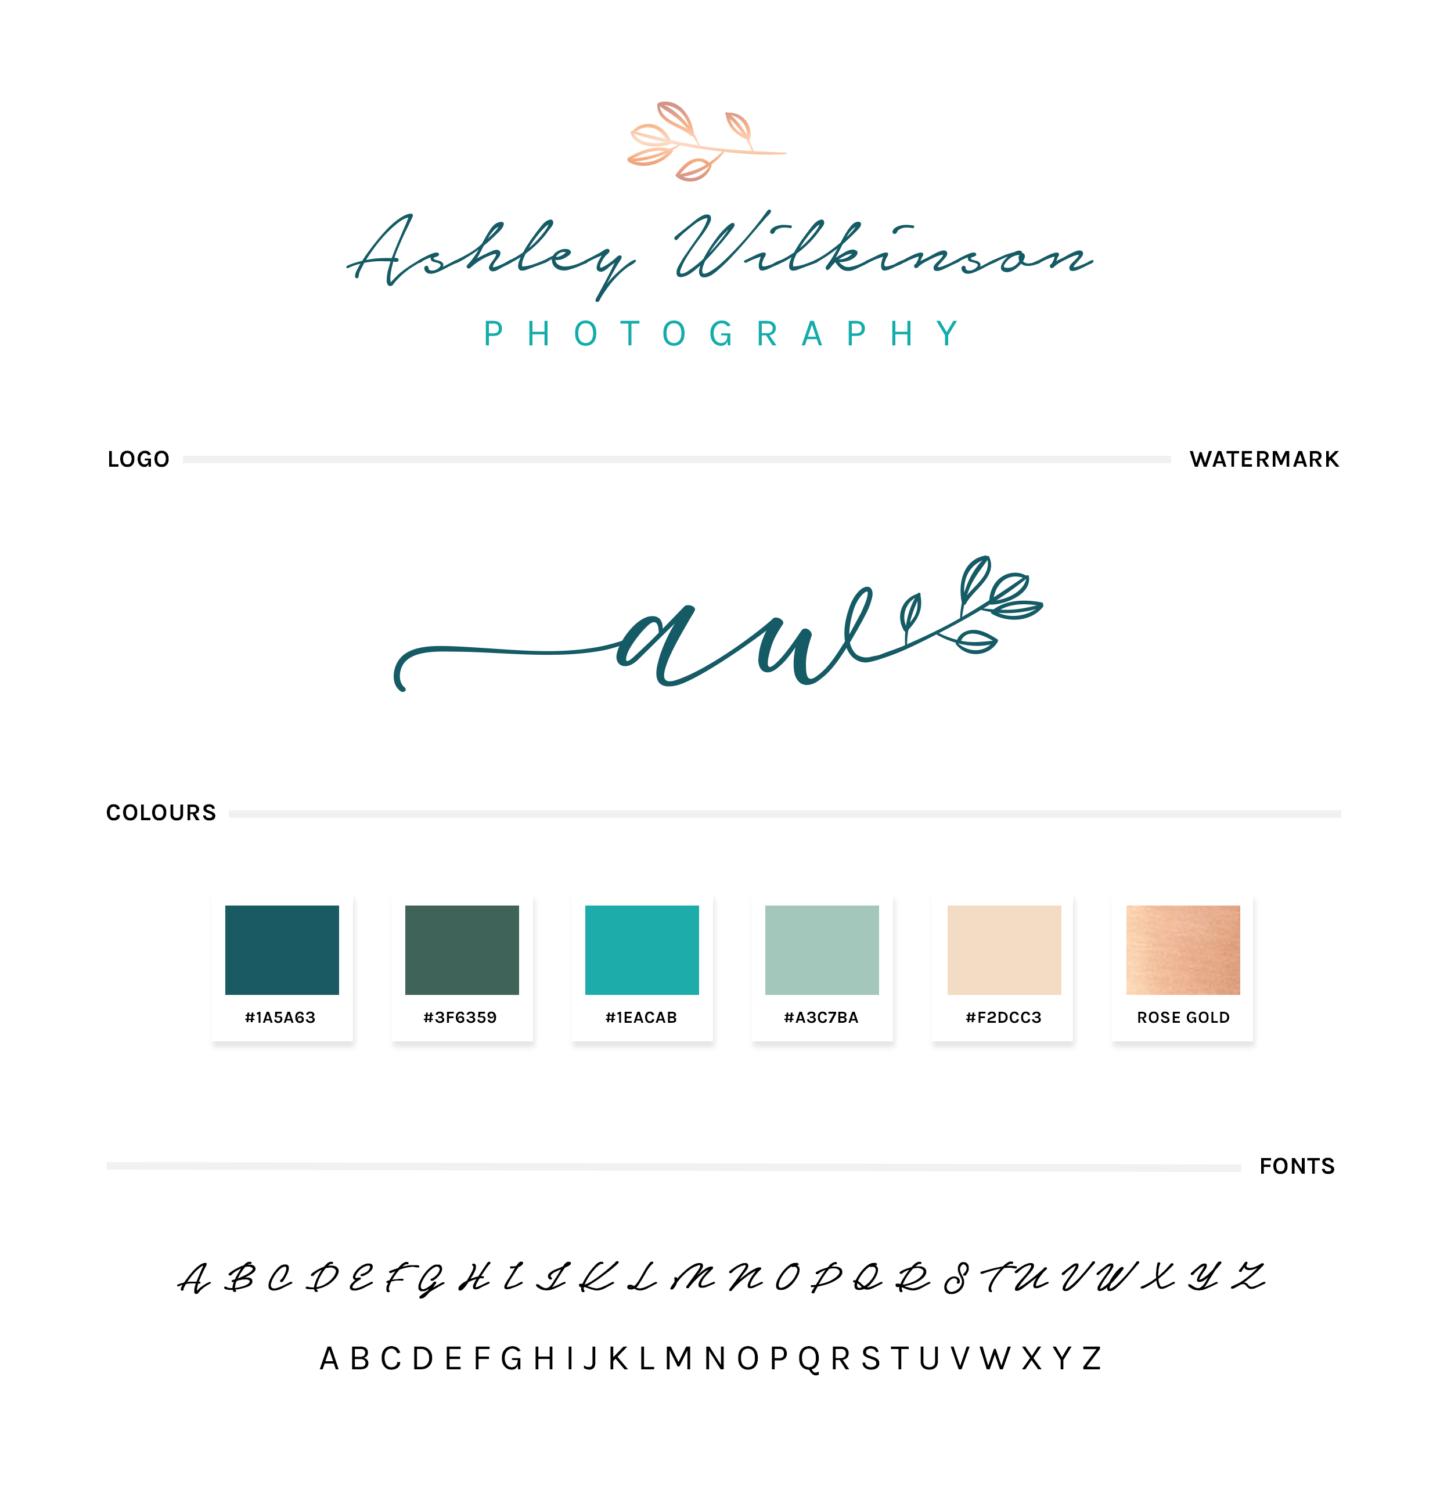 Ashley Wilkinson Photography styleguide